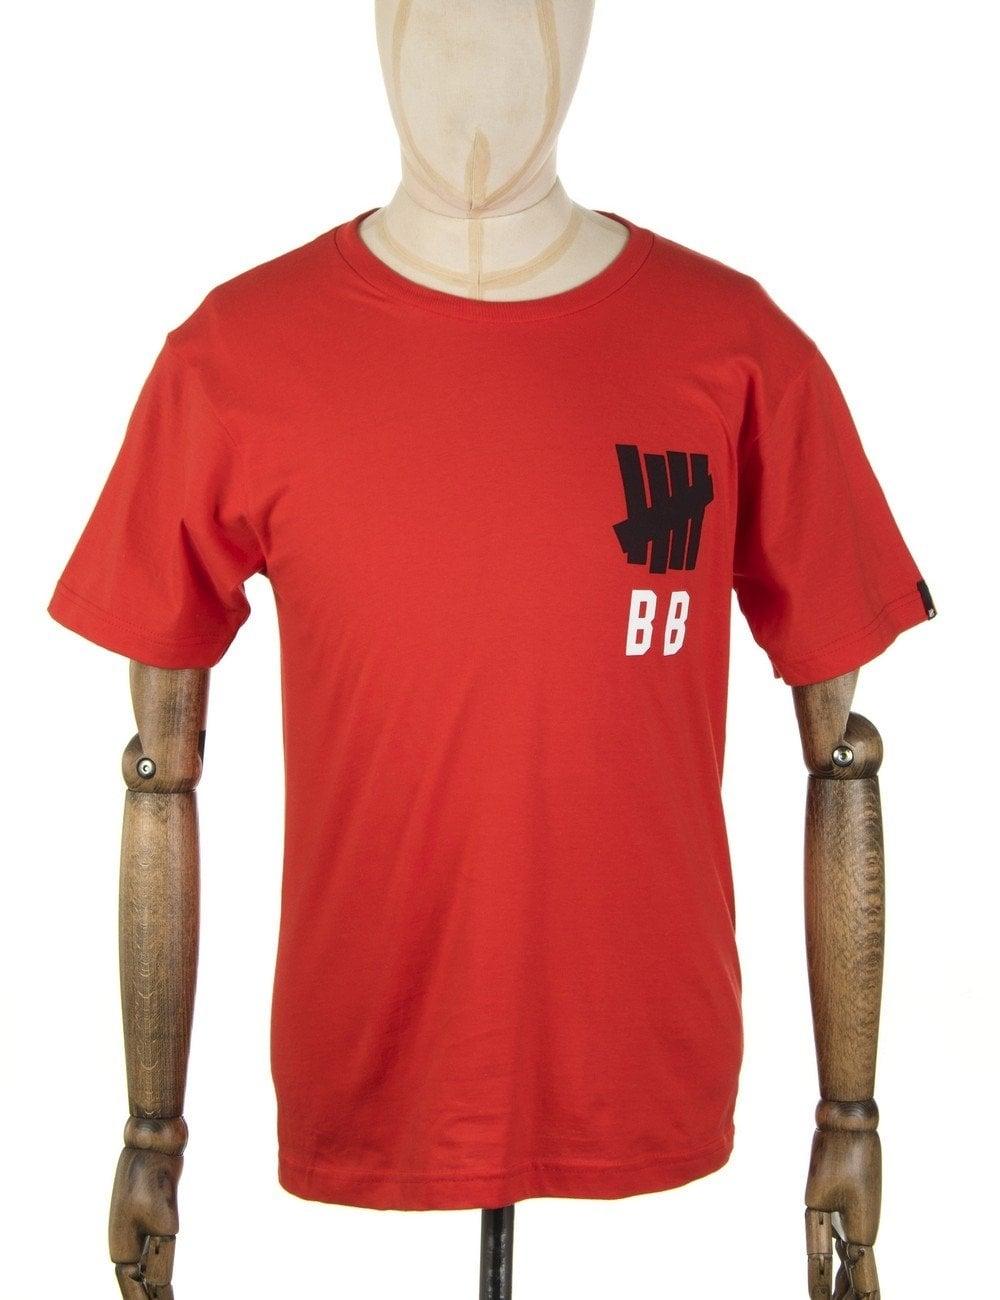 Undefeated Bat Boy T Shirt Red